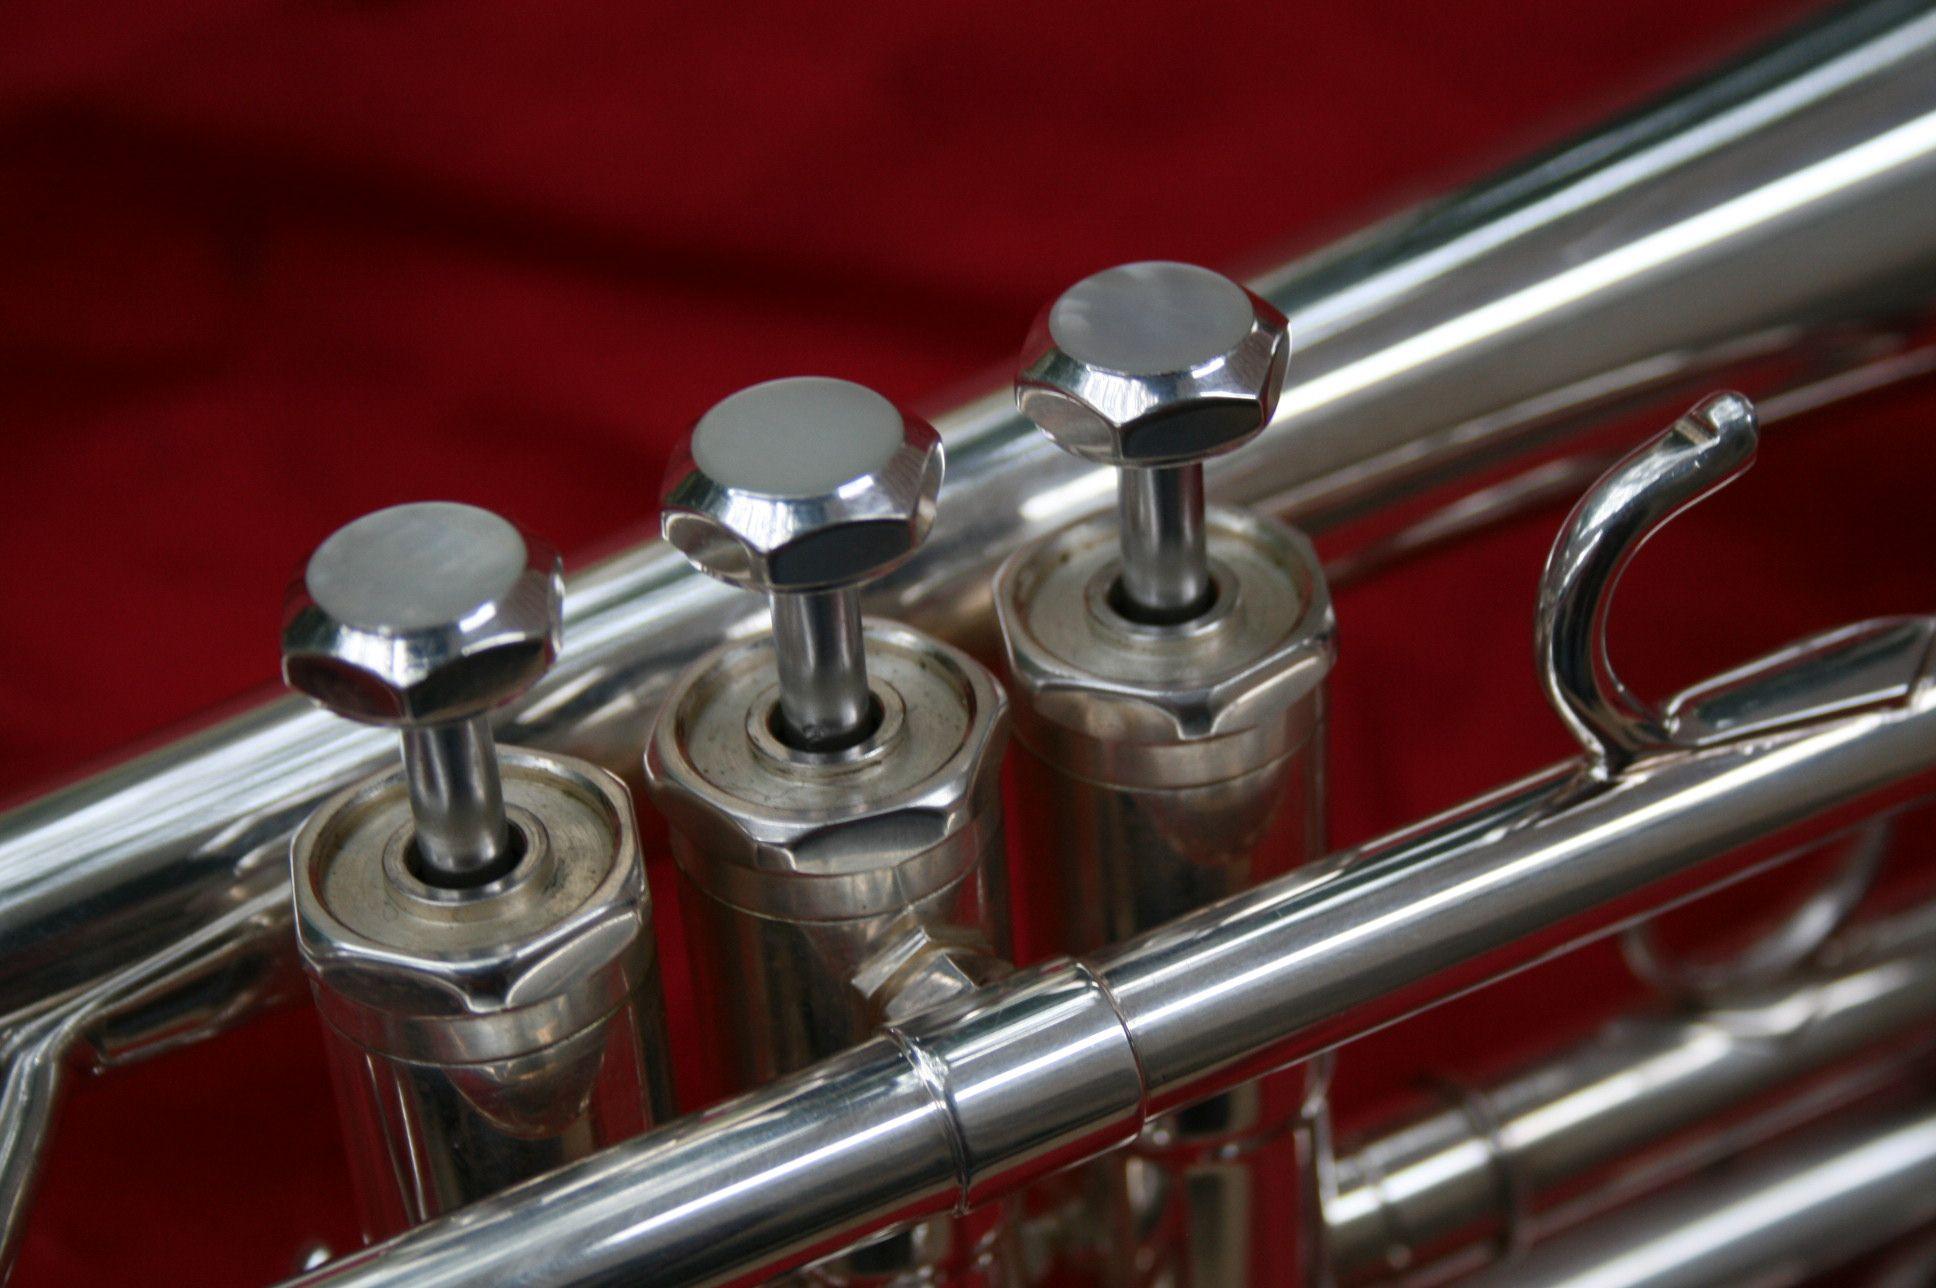 10PCS Silver Metal Trumpet Piston Stem Valve Piston Stems Musical Parts